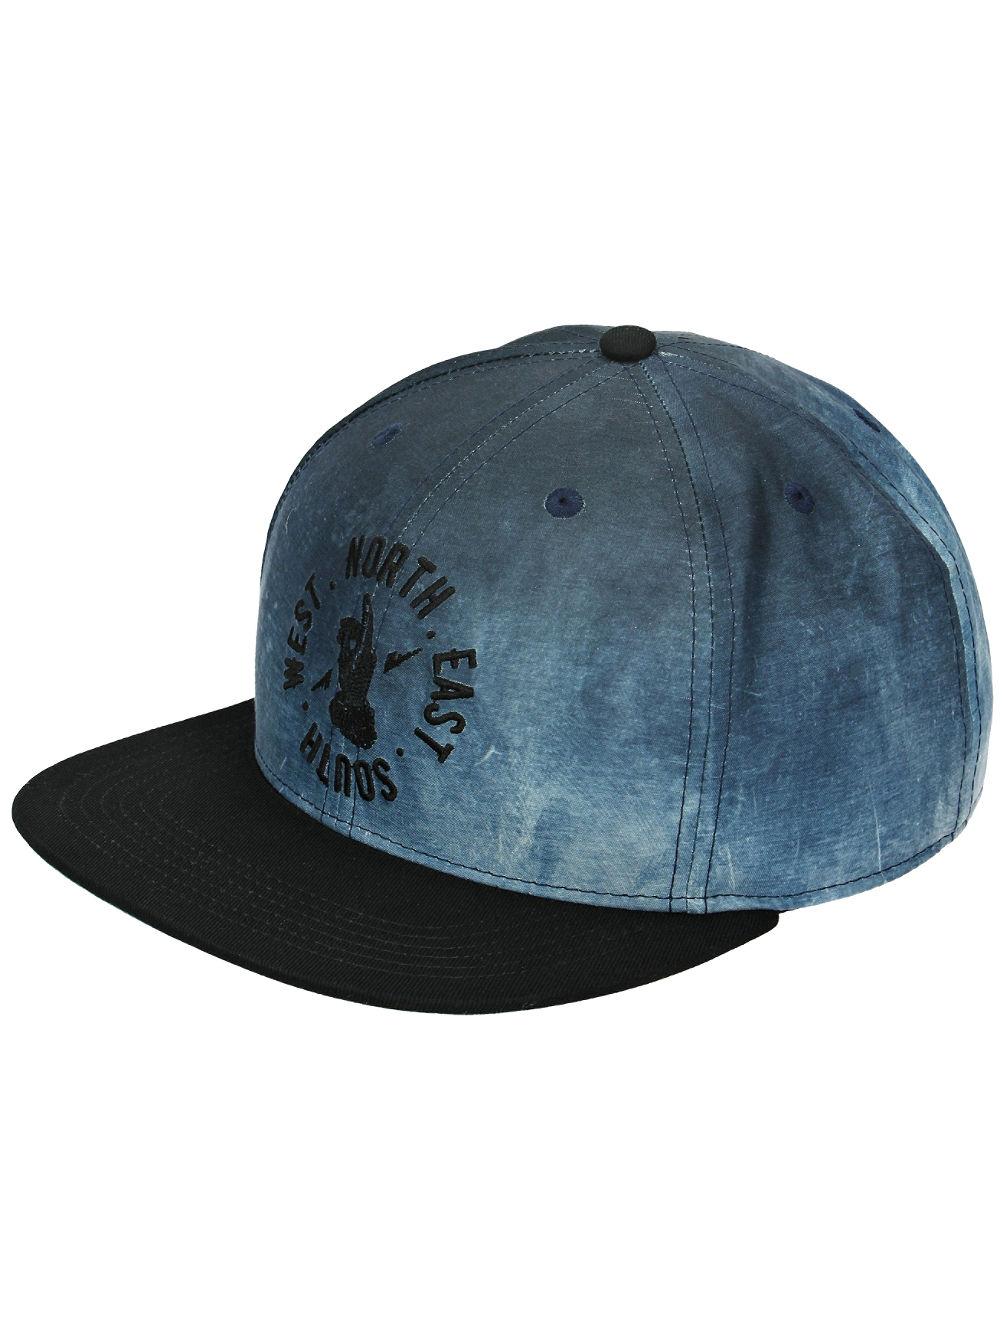 blue-tomato-bt-nswe-cap